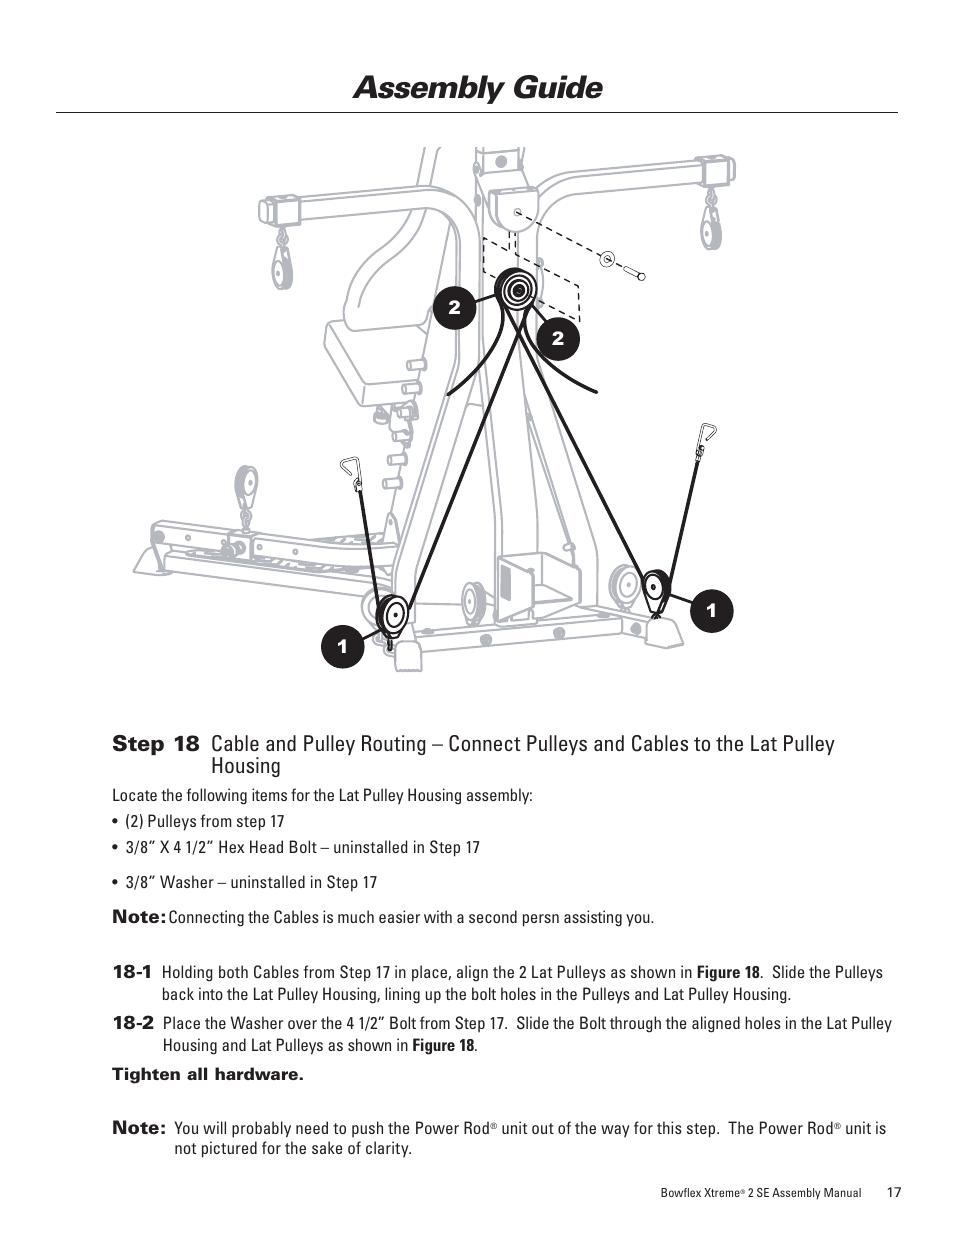 assembly guide bowflex xtreme 2 se user manual page 21 28 rh manualsdir com Bowflex Adjustable Dumbbells Bowflex Treadmill Series 7